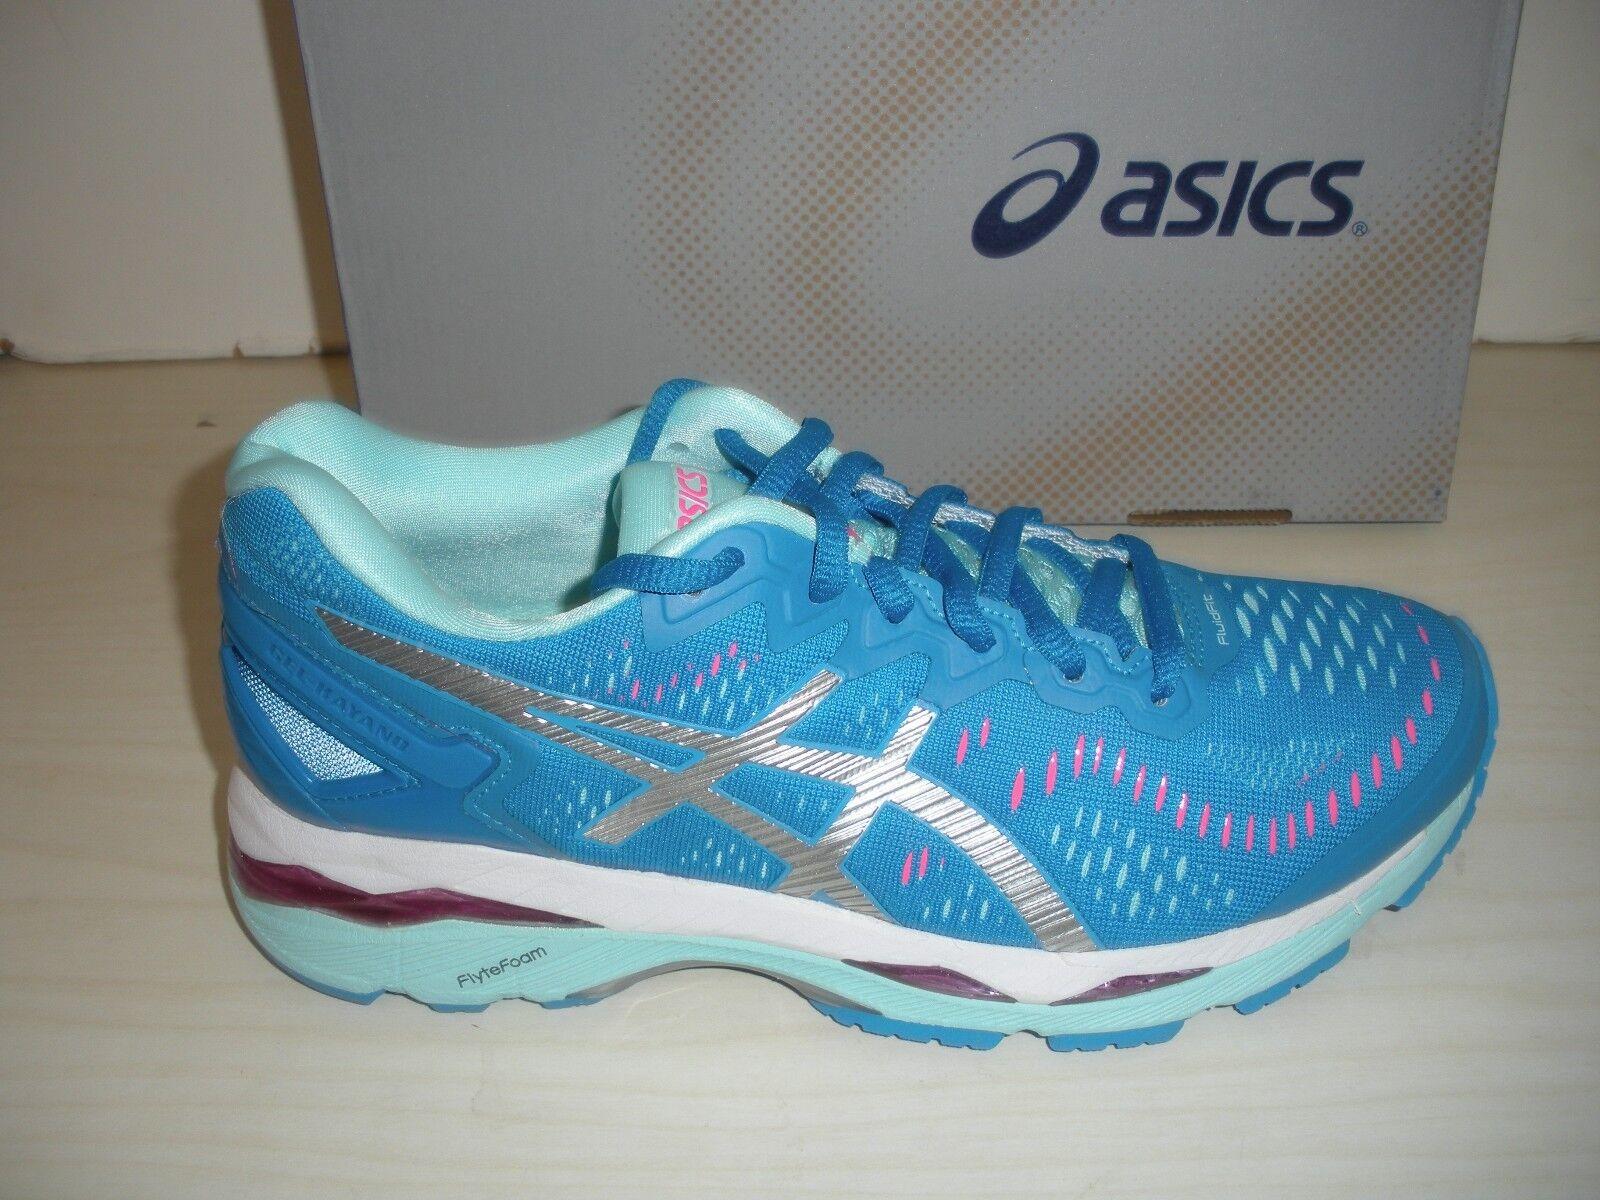 ASICS ASICS ASICS WOMENS GEL-KAYANO 23 RUNNING SNEAKERS-SHOES-T696N -4393- DIVA blueE- SZ 7 cf6944